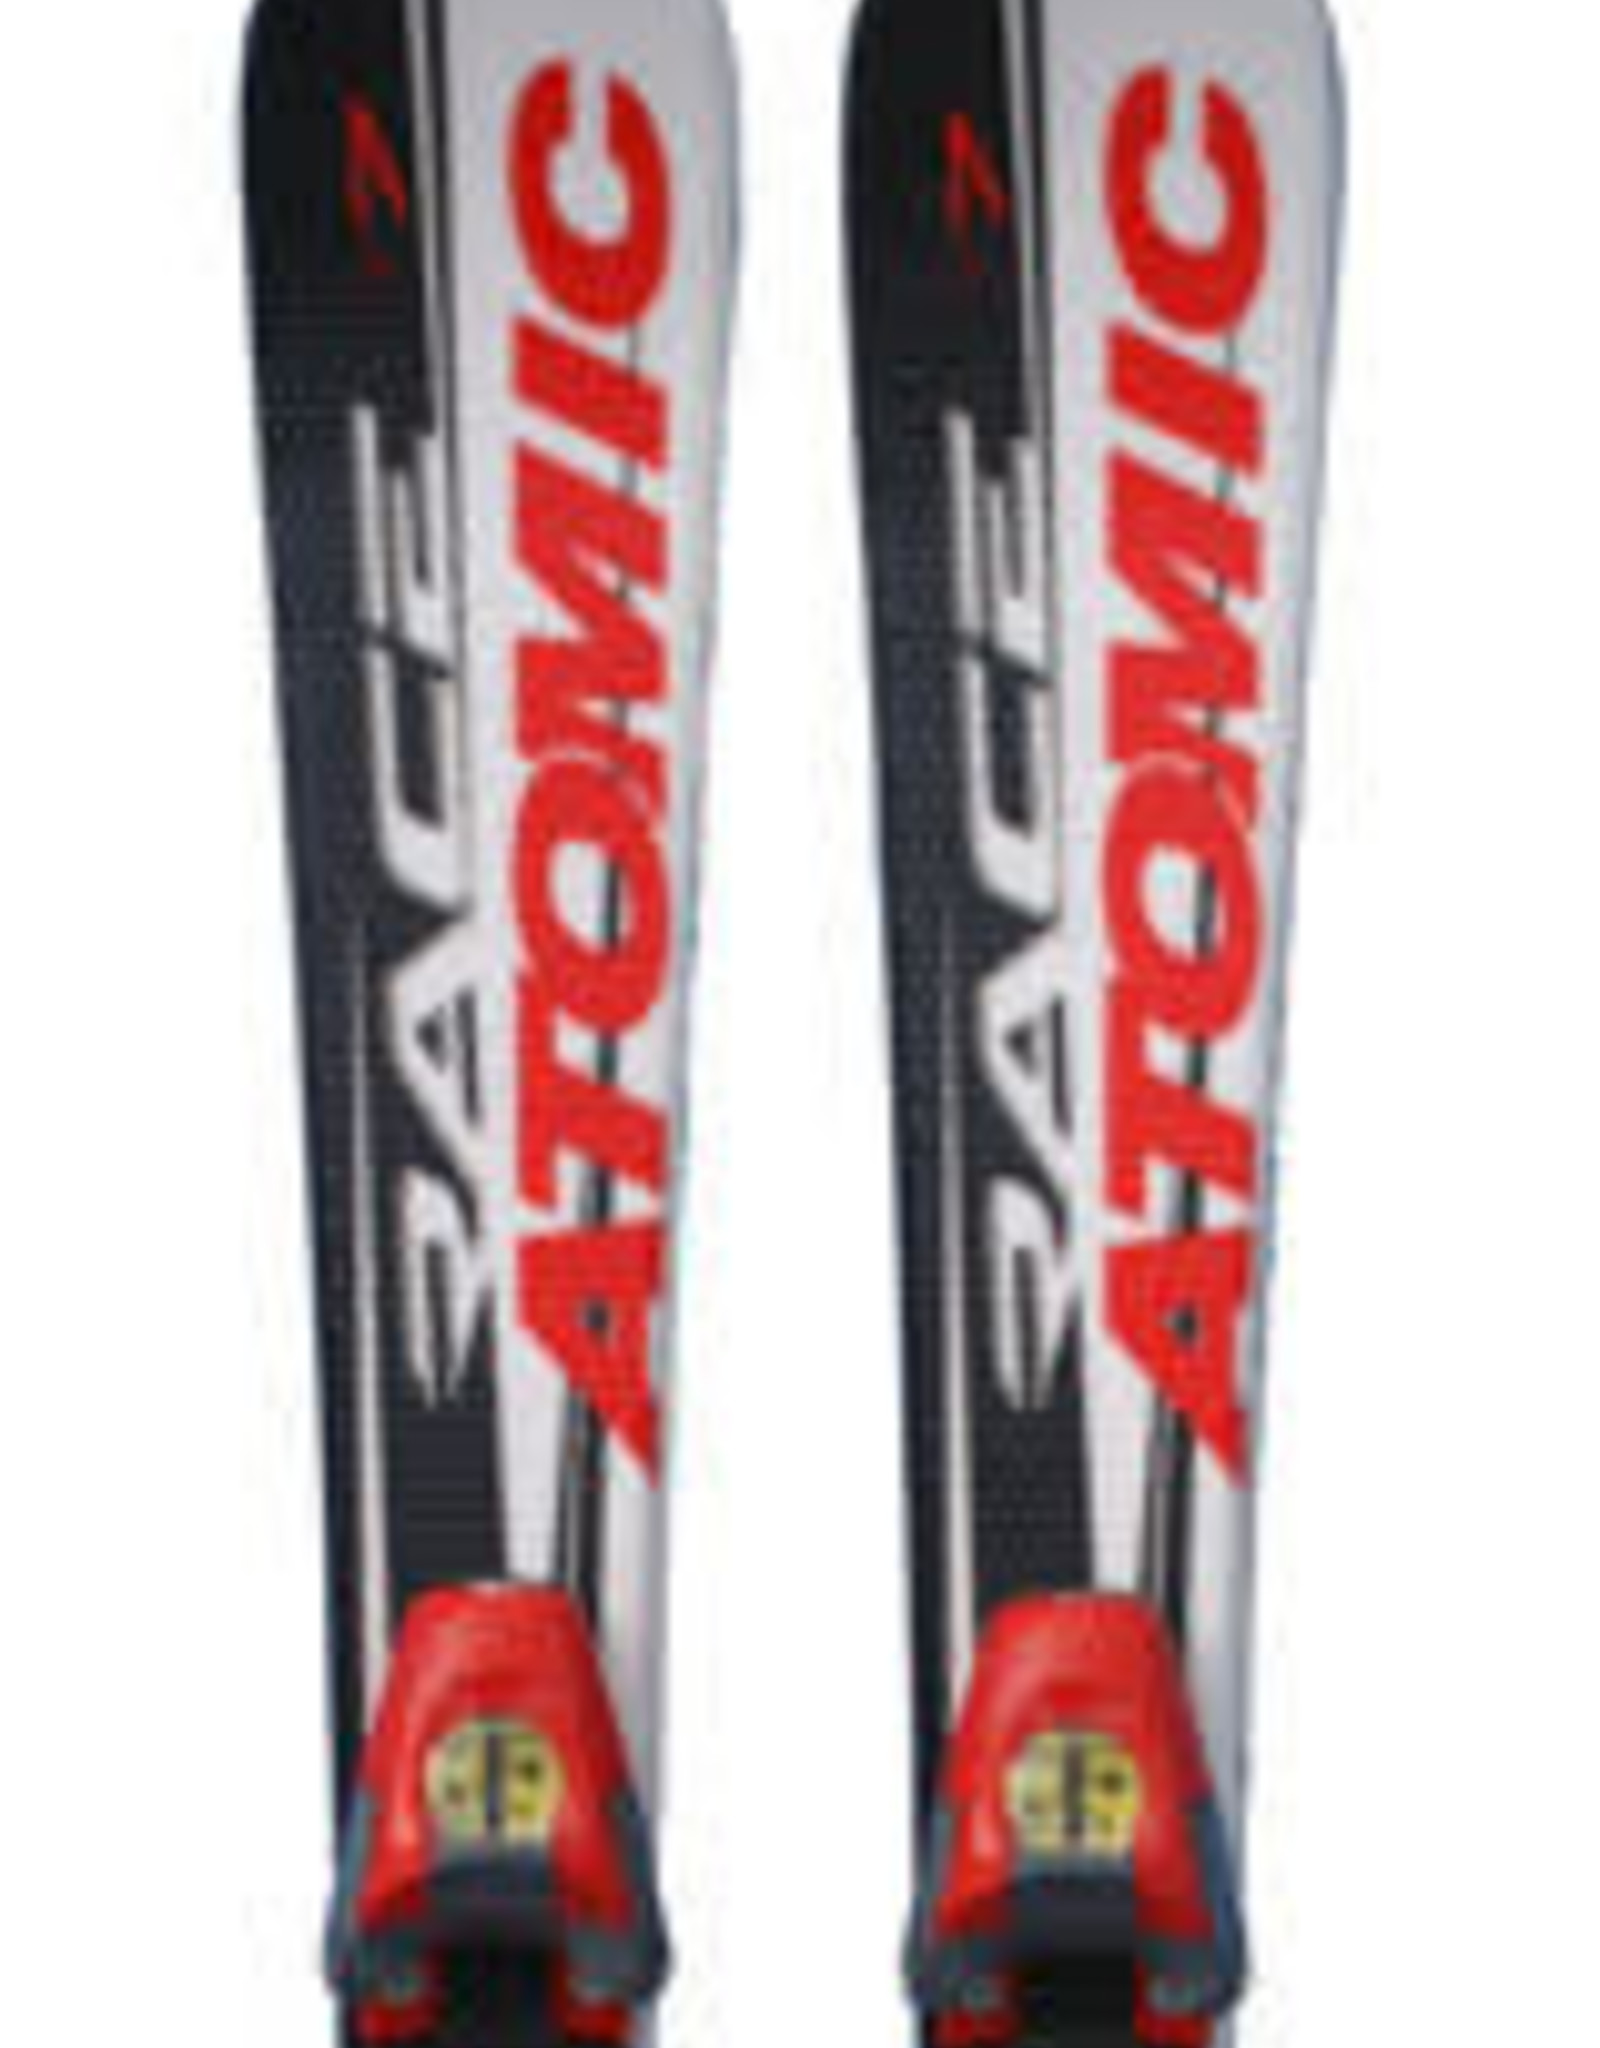 ATOMIC ATOMIC Race 7 (7=Rood) Ski's Gebruikt 80cm